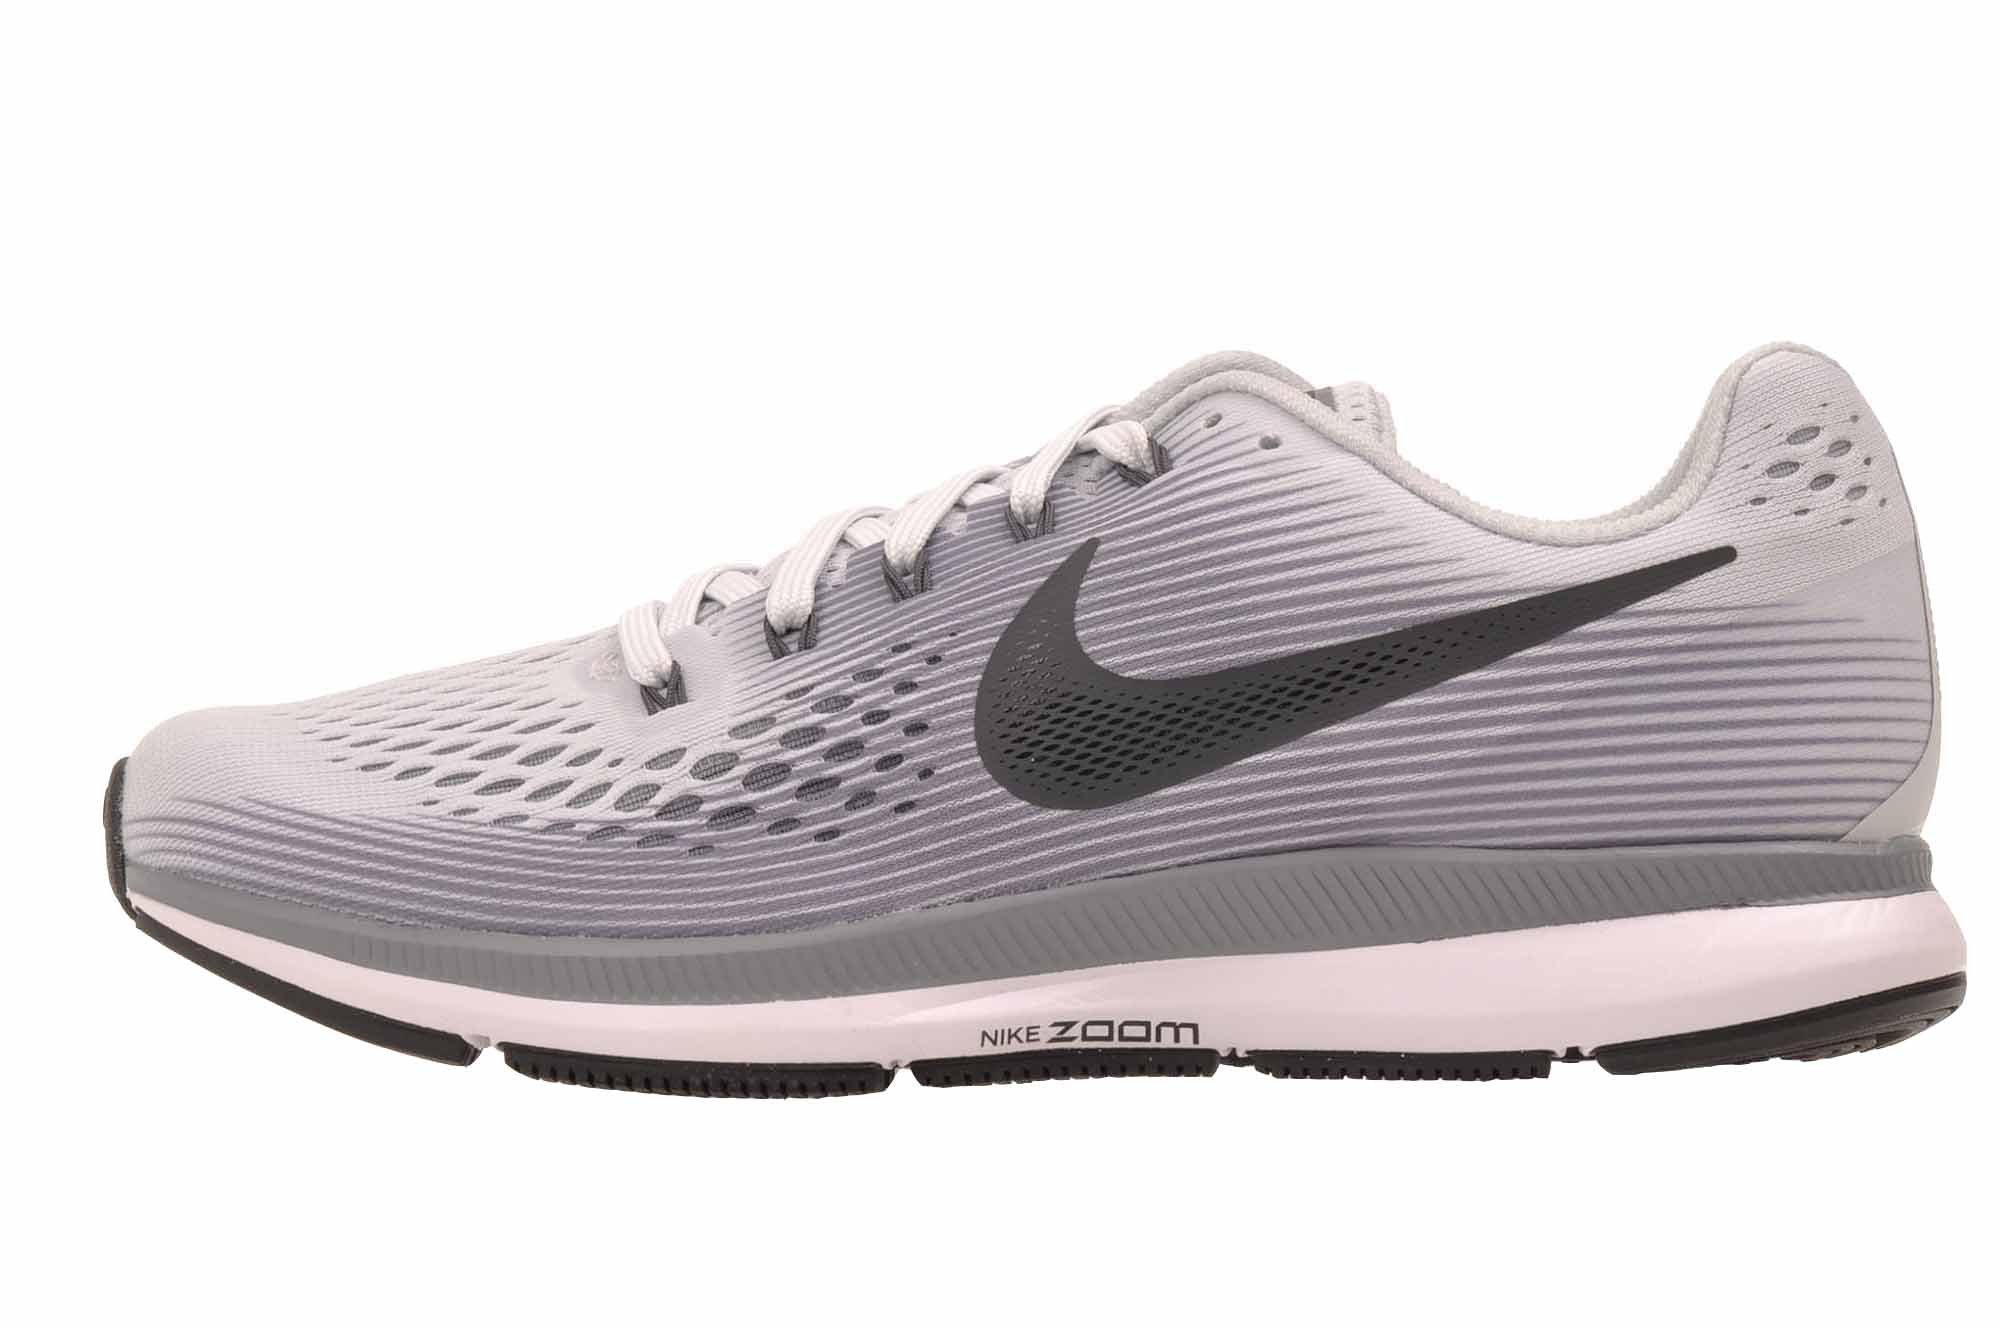 Nike Women's Air Zoom Pegasus 34 Pure Platinum/Anthracite Running Shoe